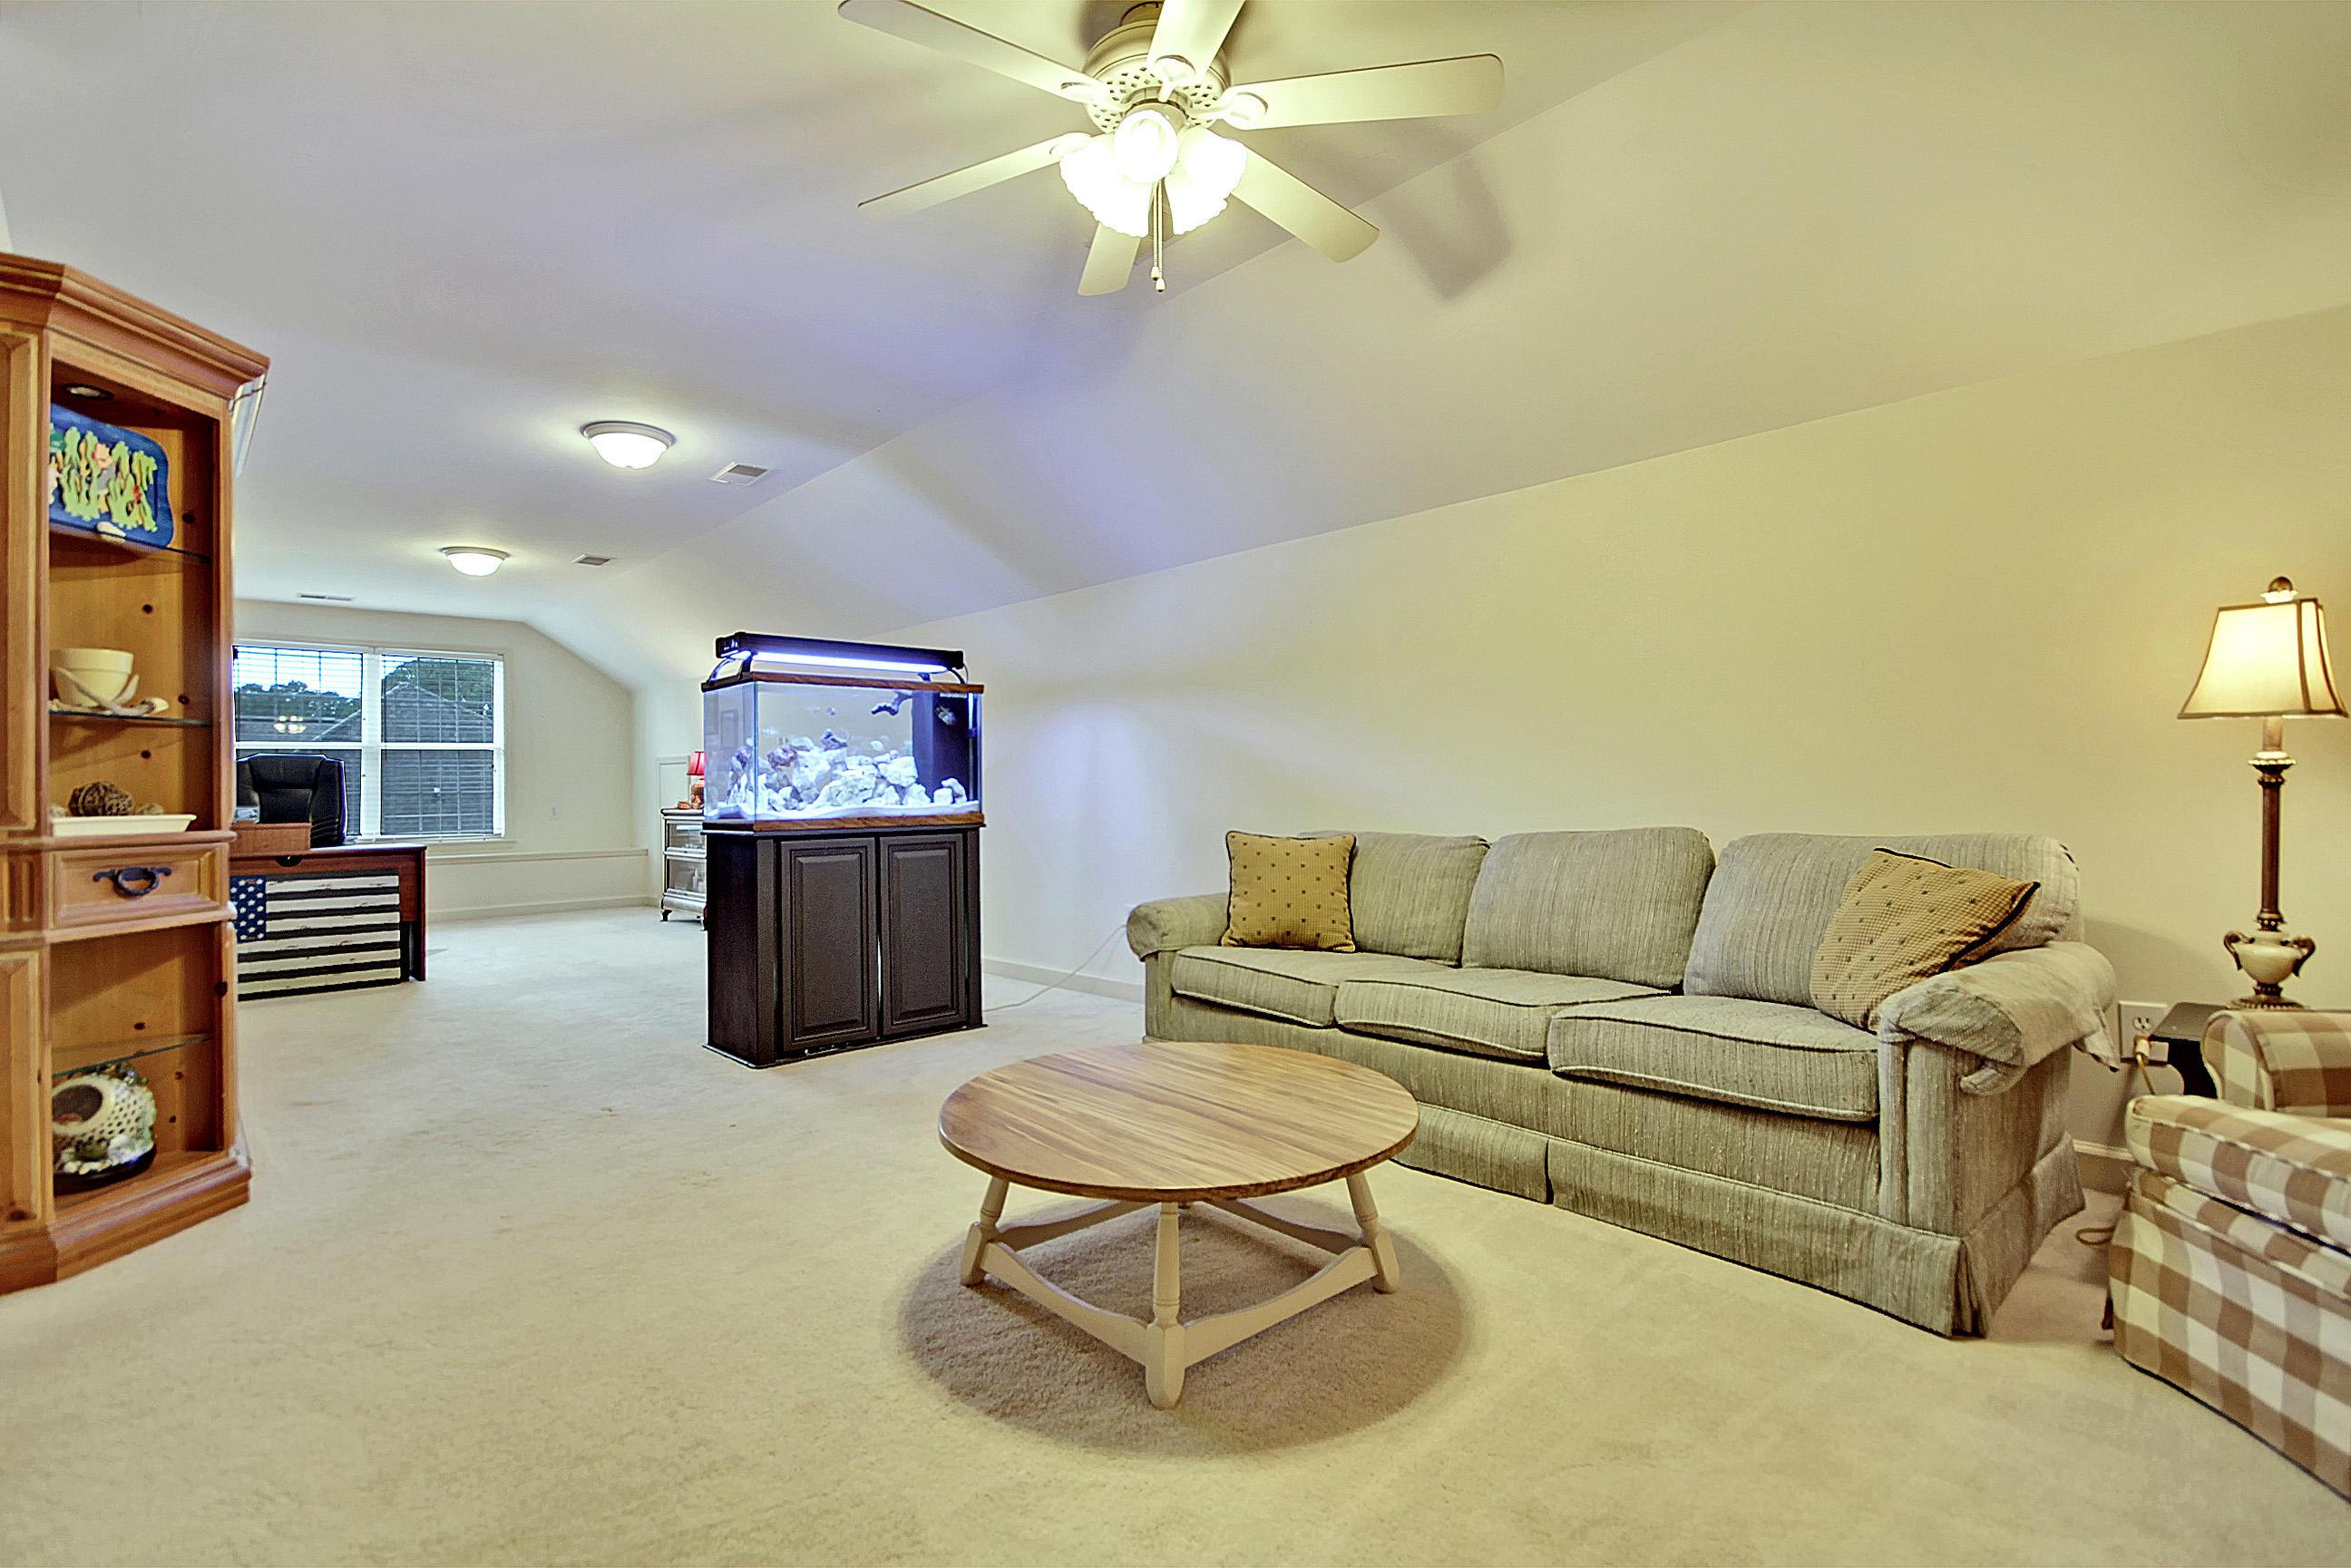 Dunes West Homes For Sale - 2449 Darts Cove, Mount Pleasant, SC - 55